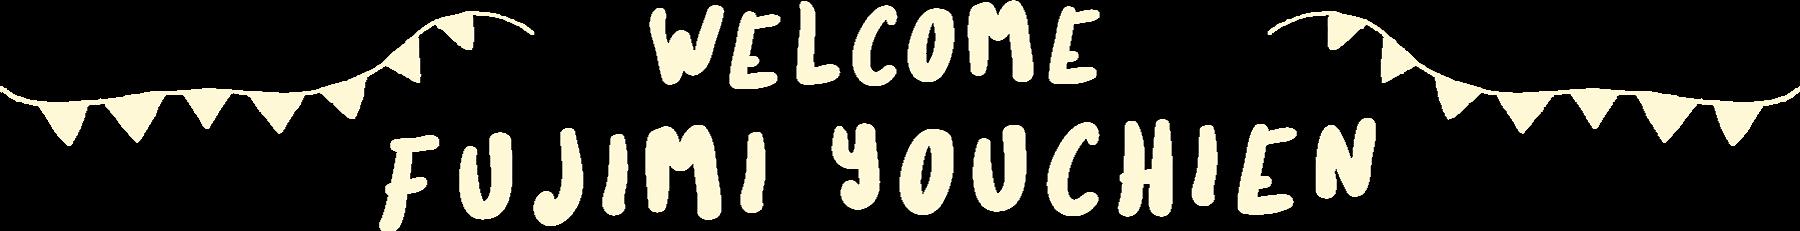 WELCOME FUJIMI YOUCHIEN